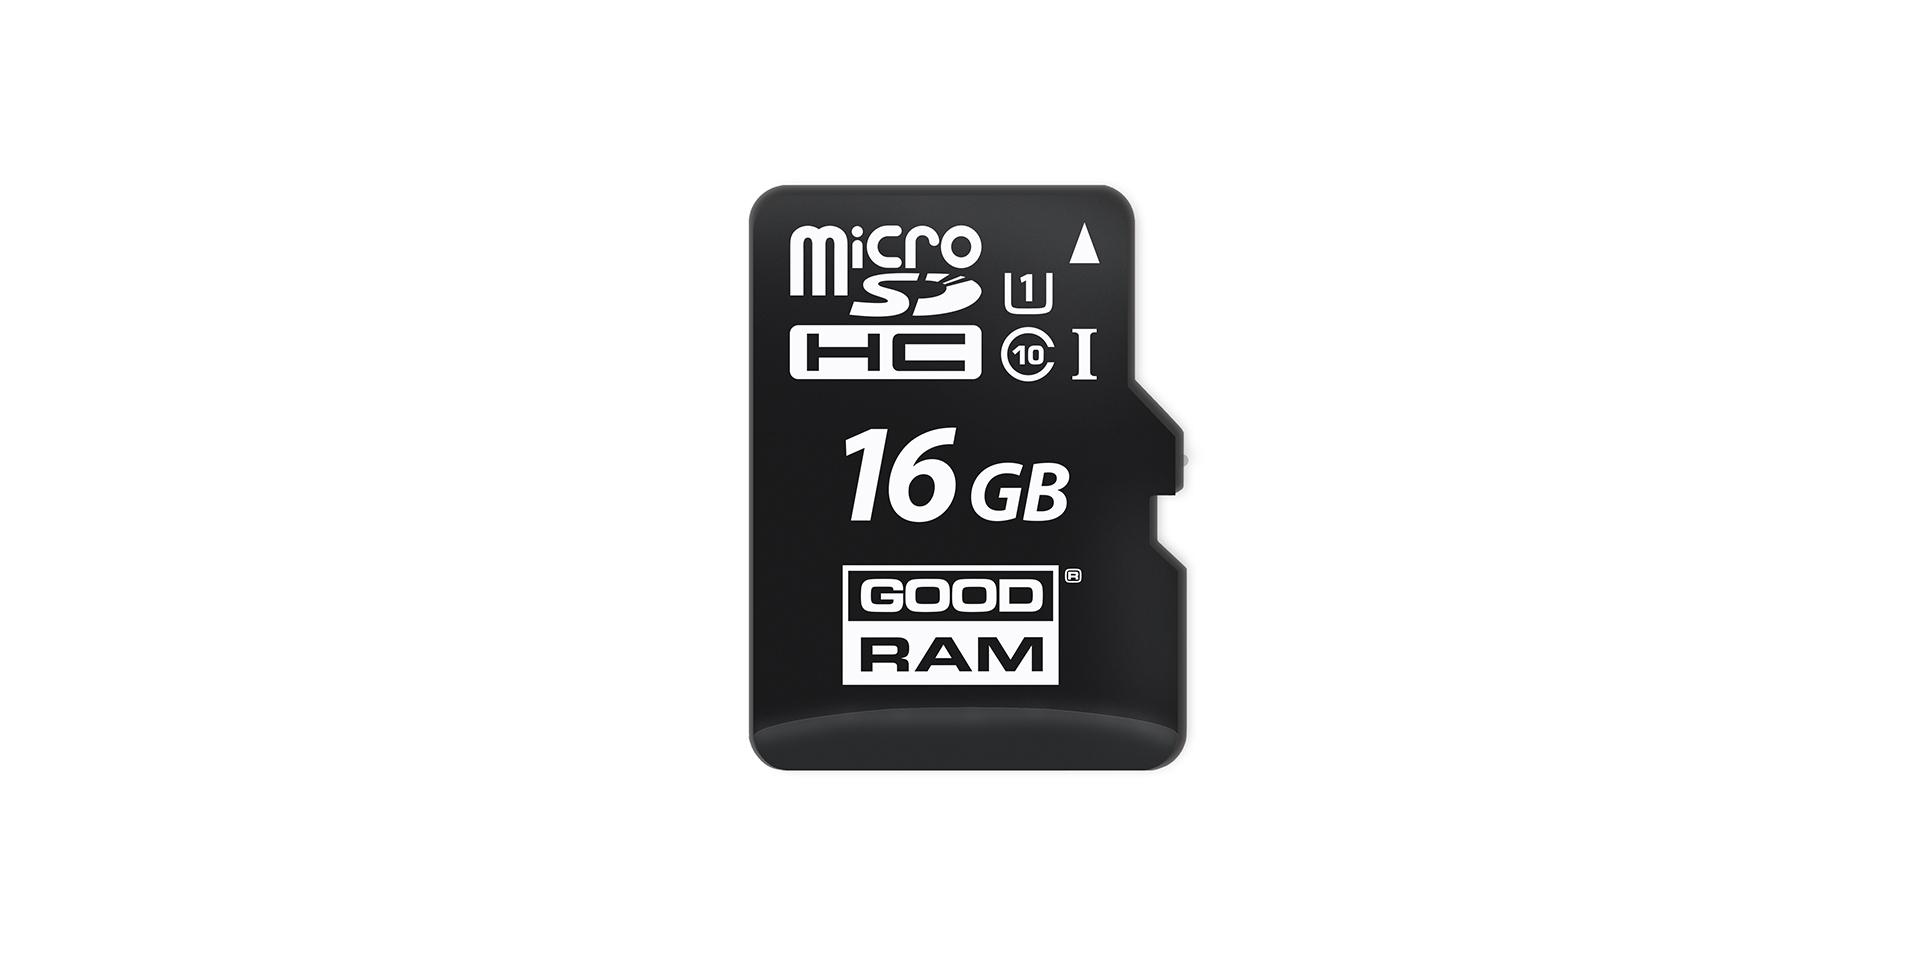 M1A0 microcard class 10